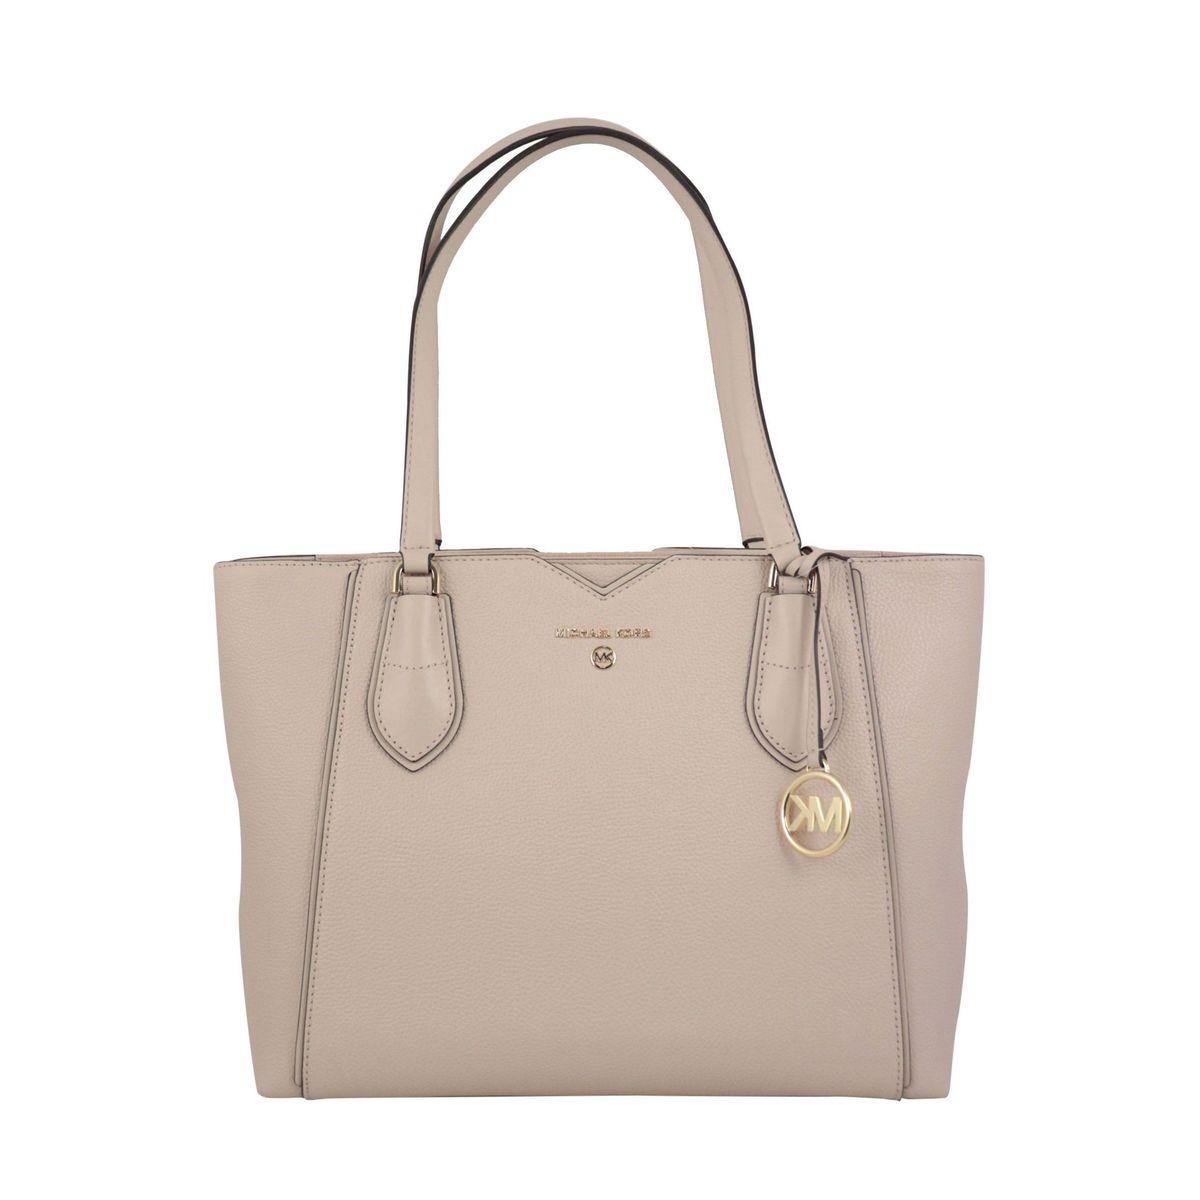 Medium Mae tote bag in grained leather Rosa / powder Michael Kors